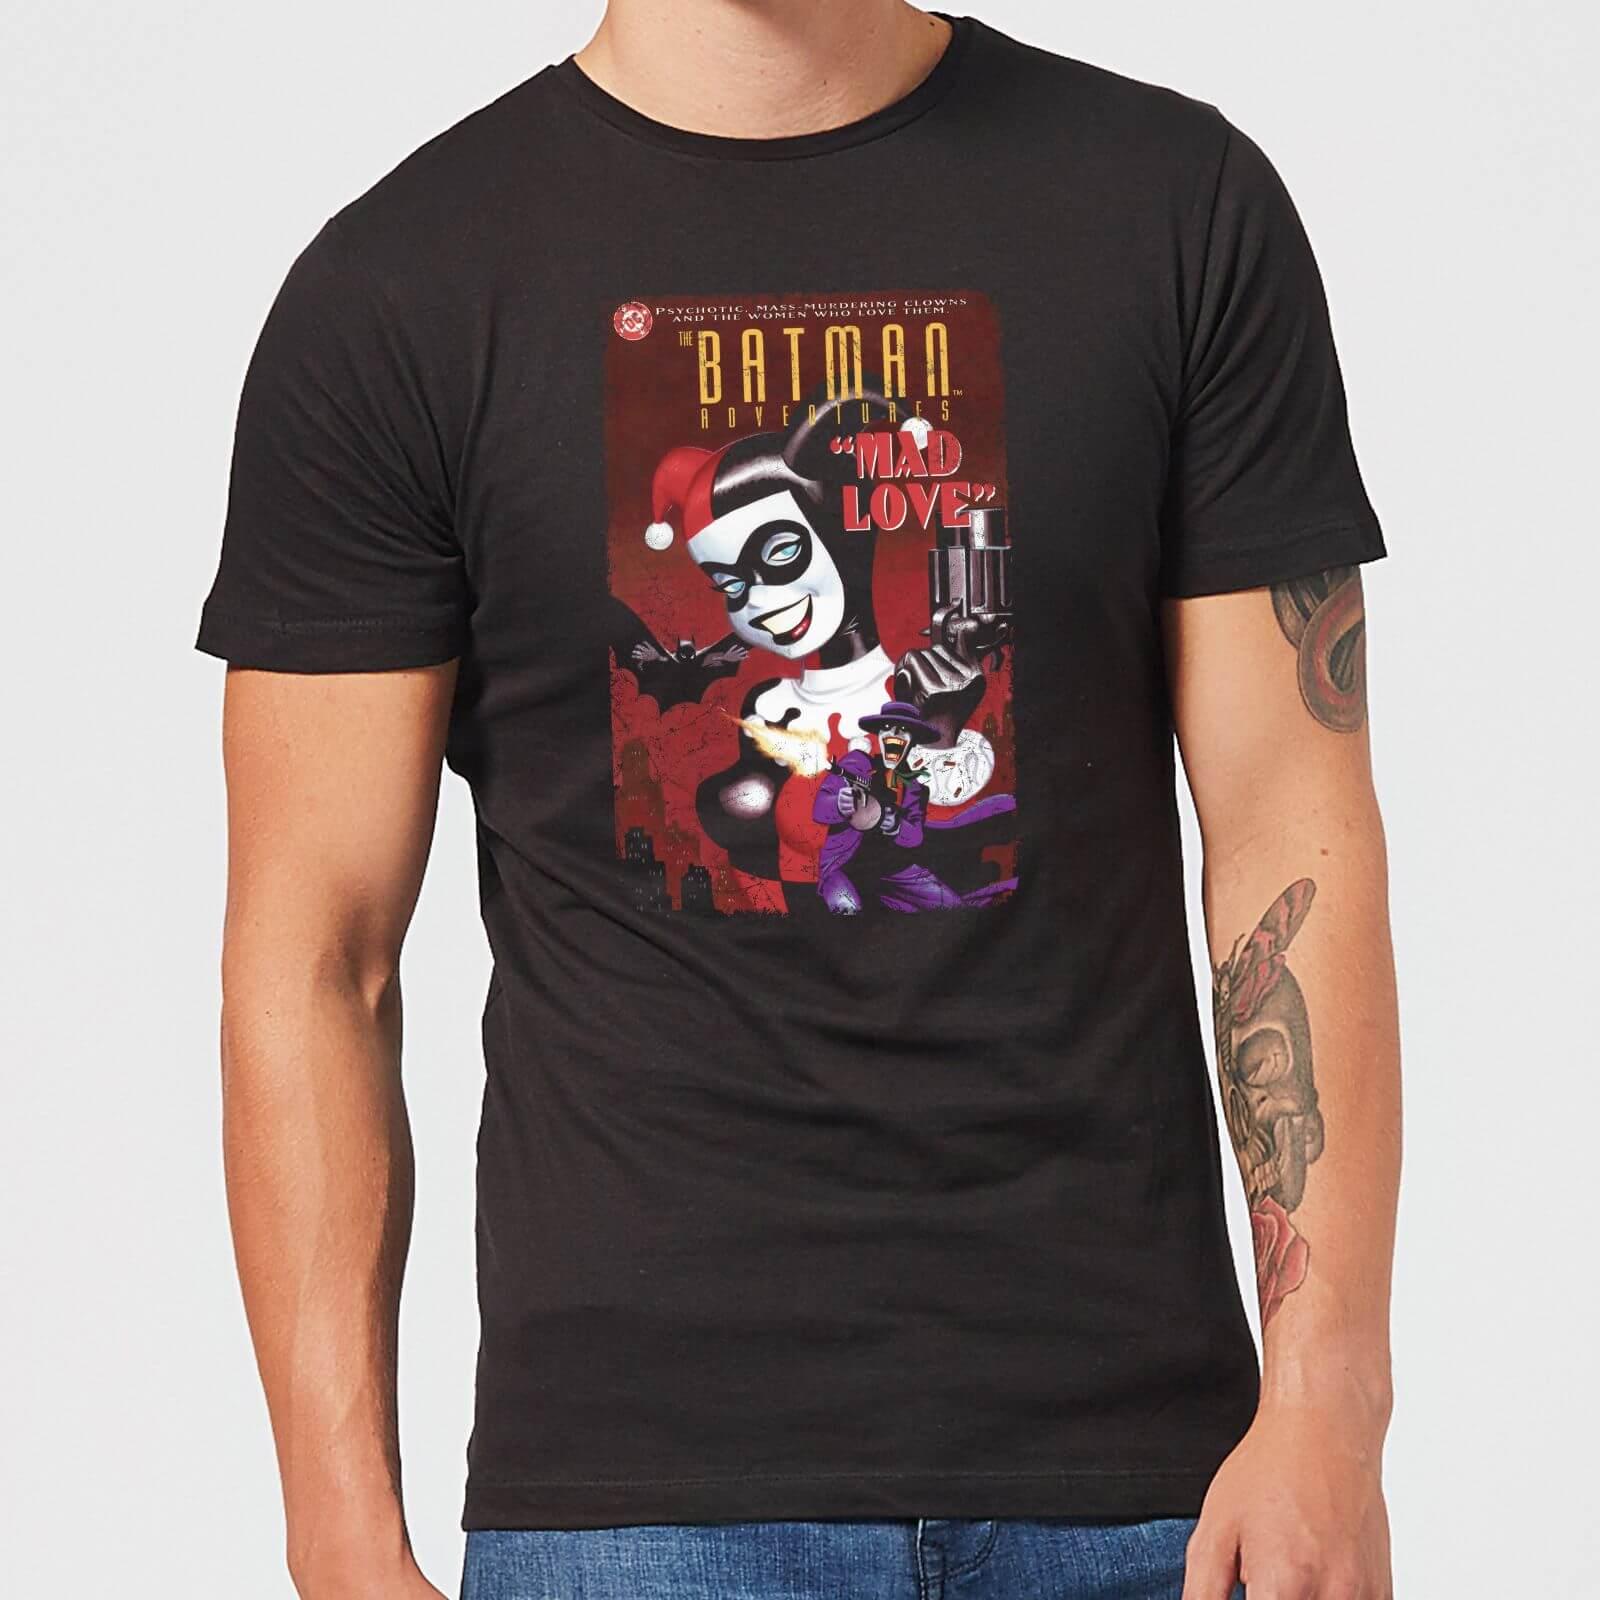 f8f56bf450d9 DC Comics Batman Harley Mad Love T-Shirt - Black Clothing | Zavvi